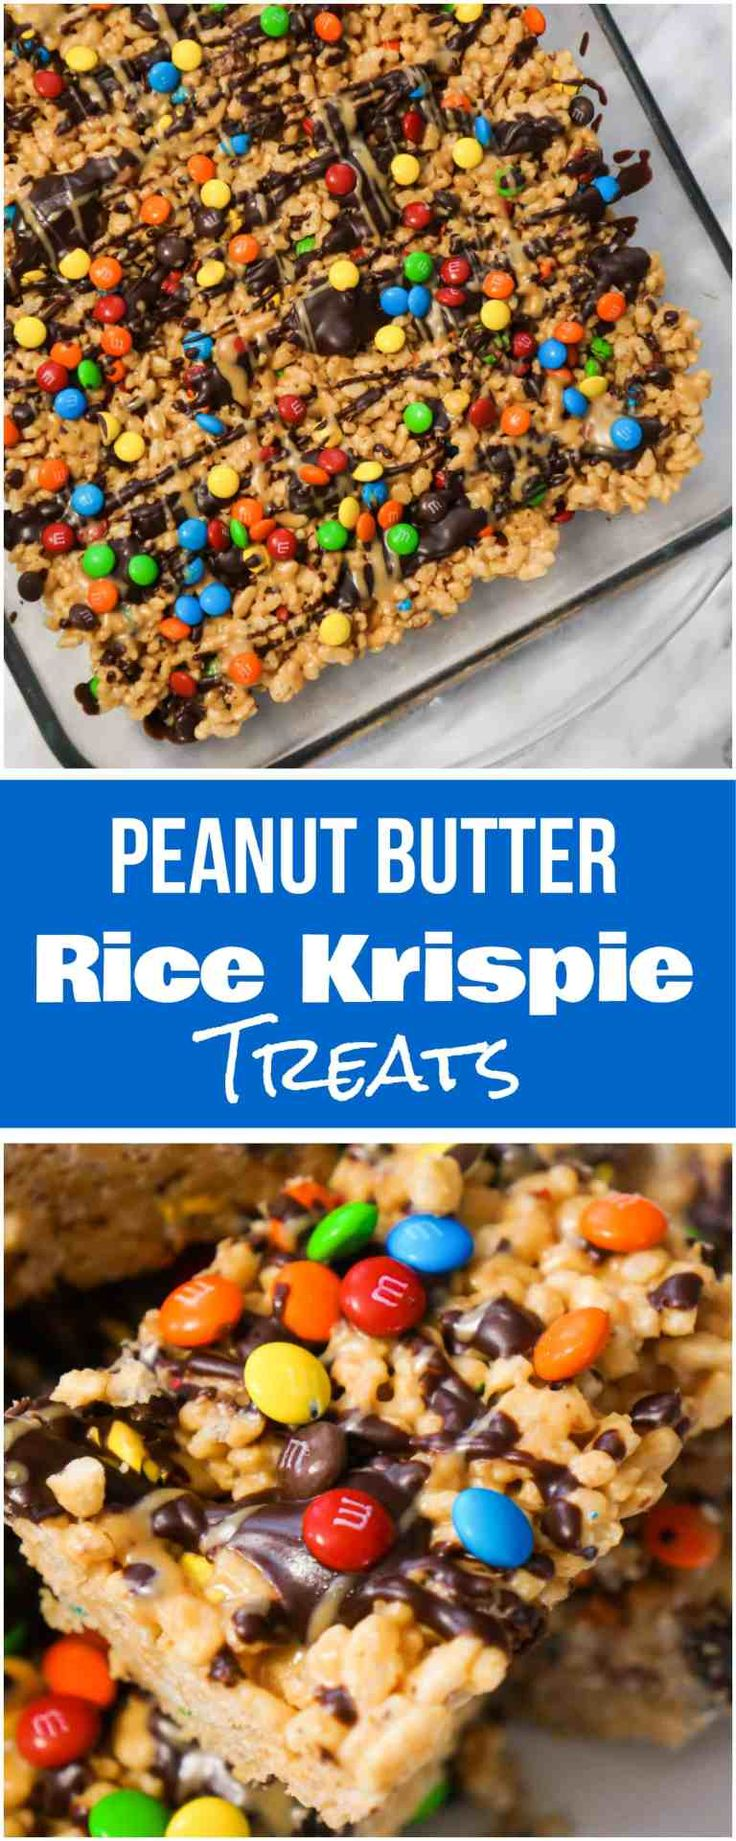 Peanut Butter Rice Krispie Treats. Easy chocolate …